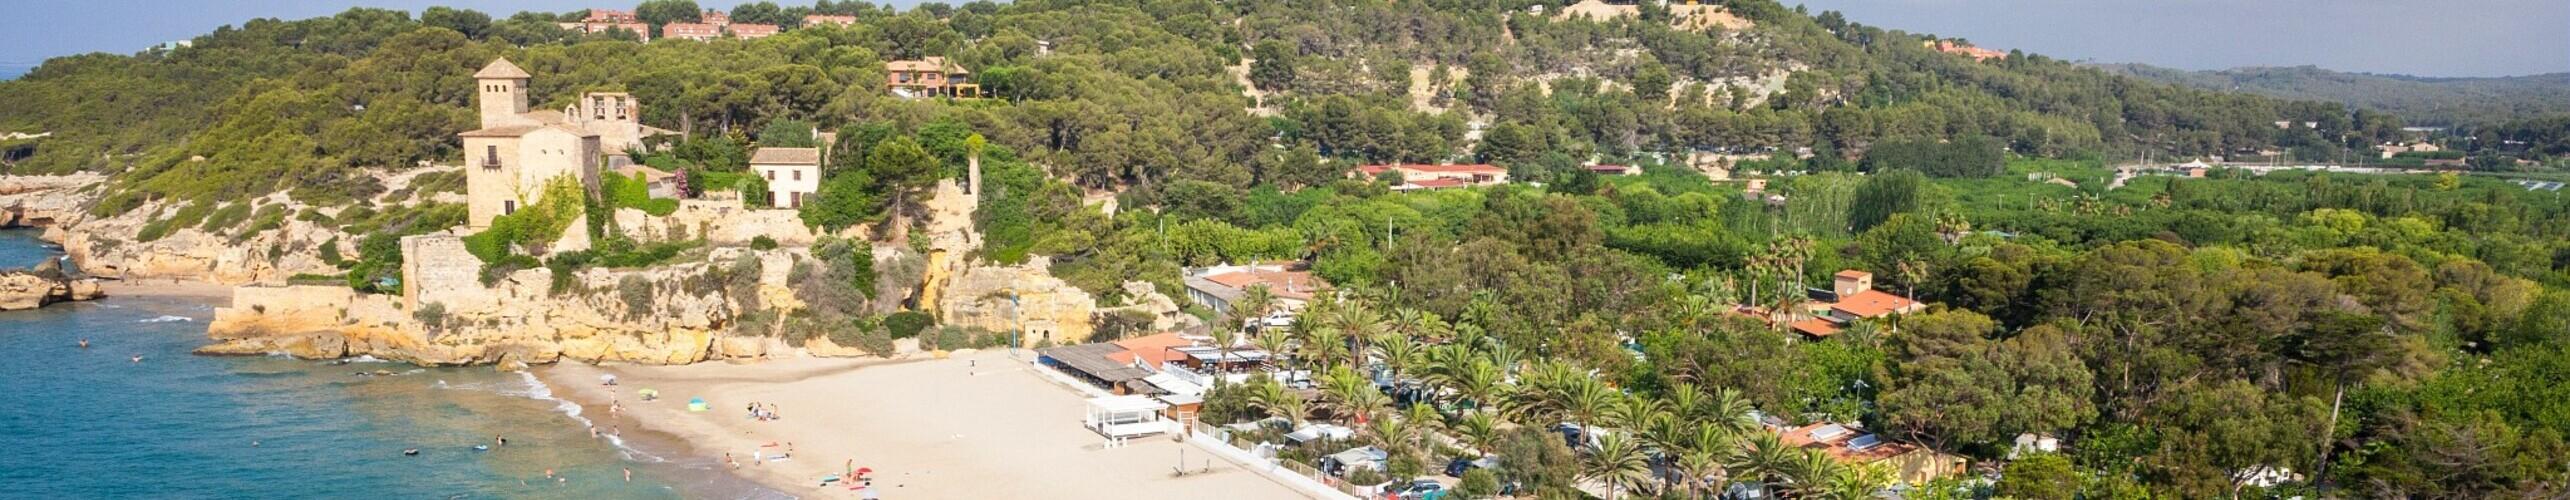 Vue aérienne de la Costa Dorada